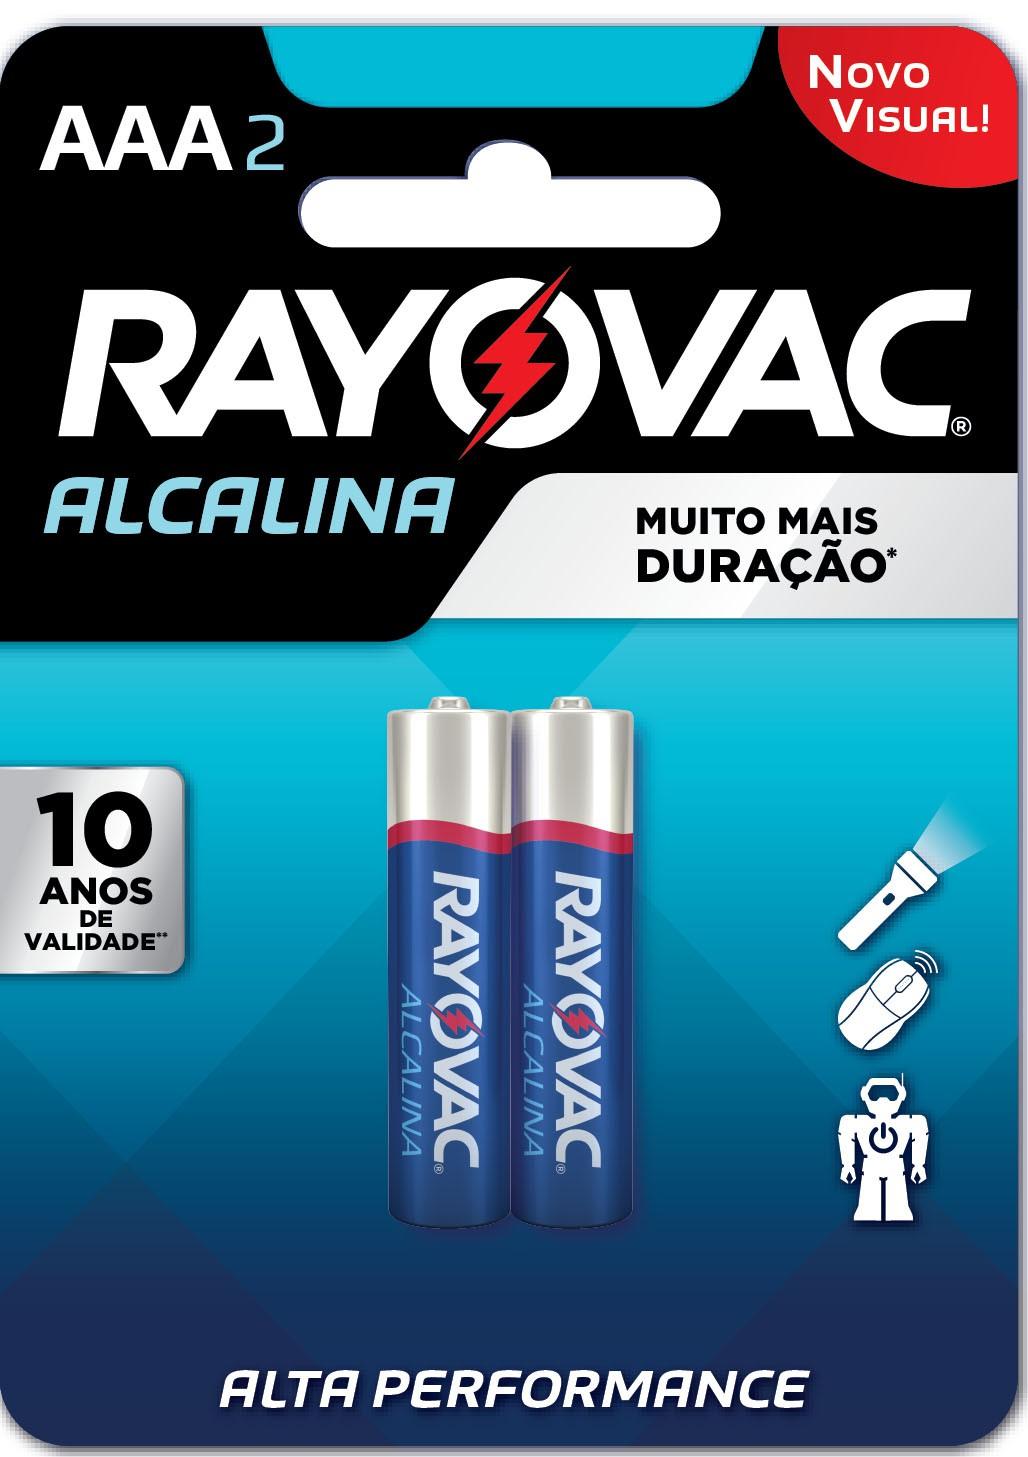 08 Pilhas AAA Alcalina RAYOVAC 4 cart c/ 2 unid